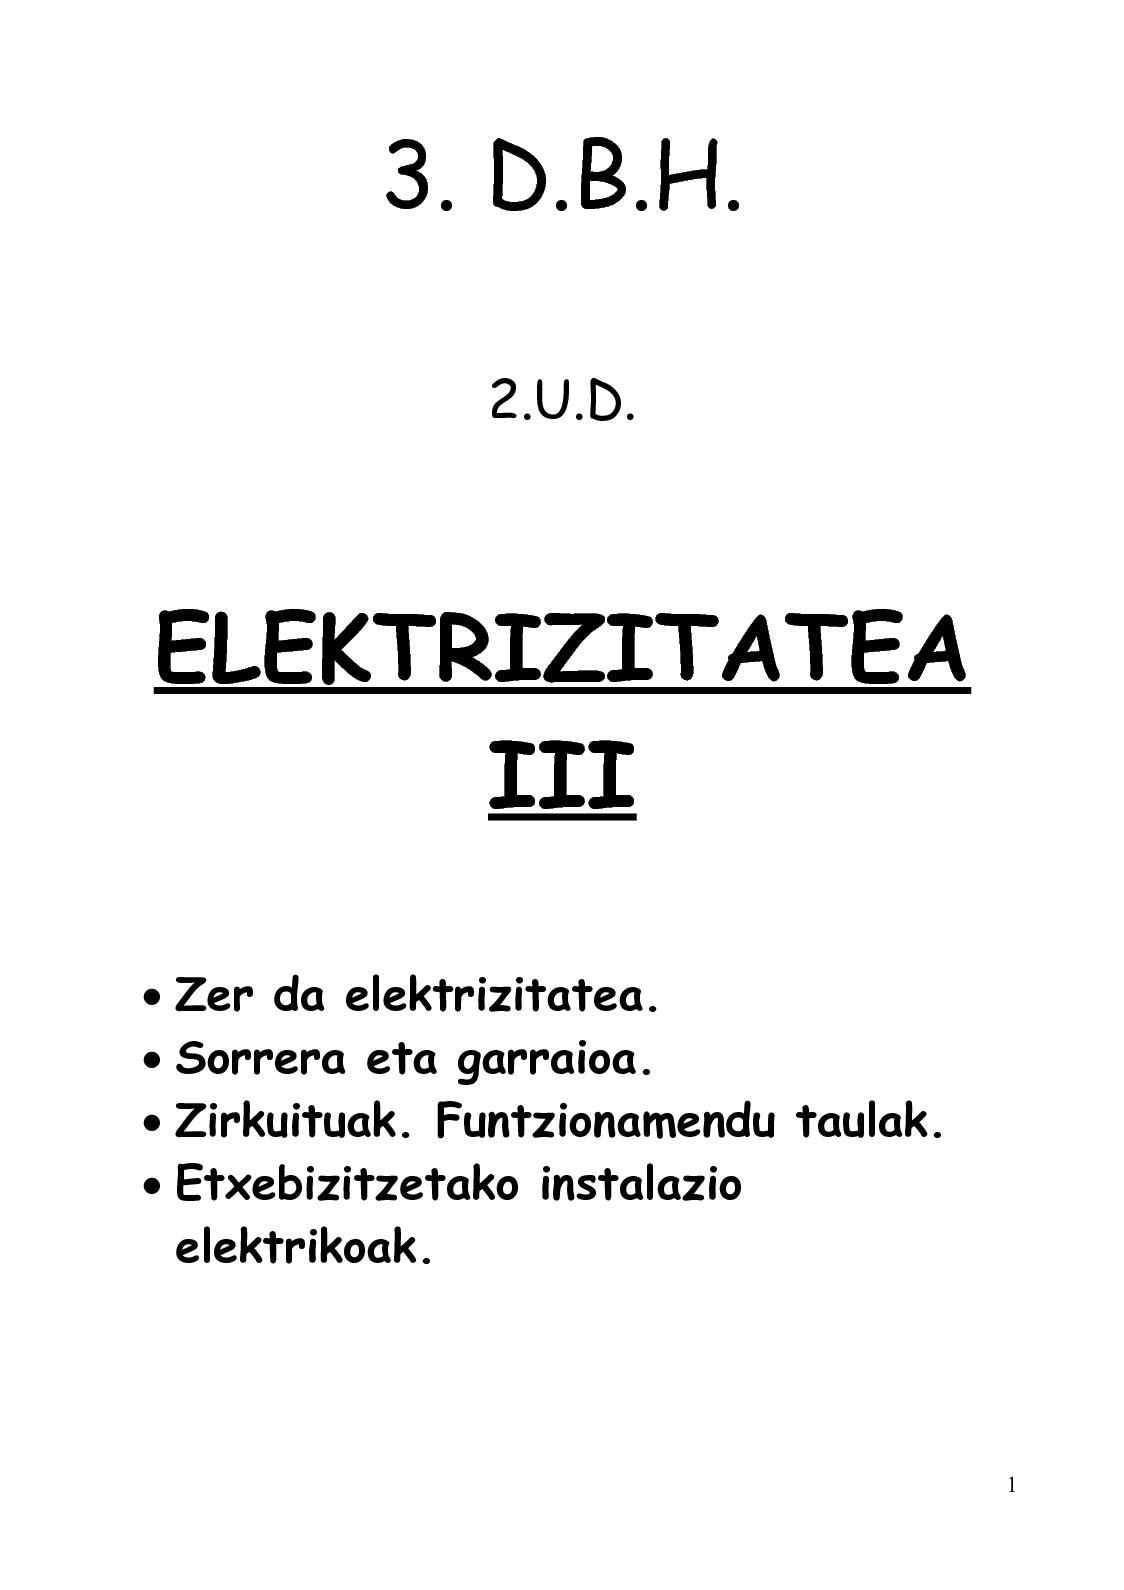 2 Ud Elektrizitatea Iii A Ikasleak